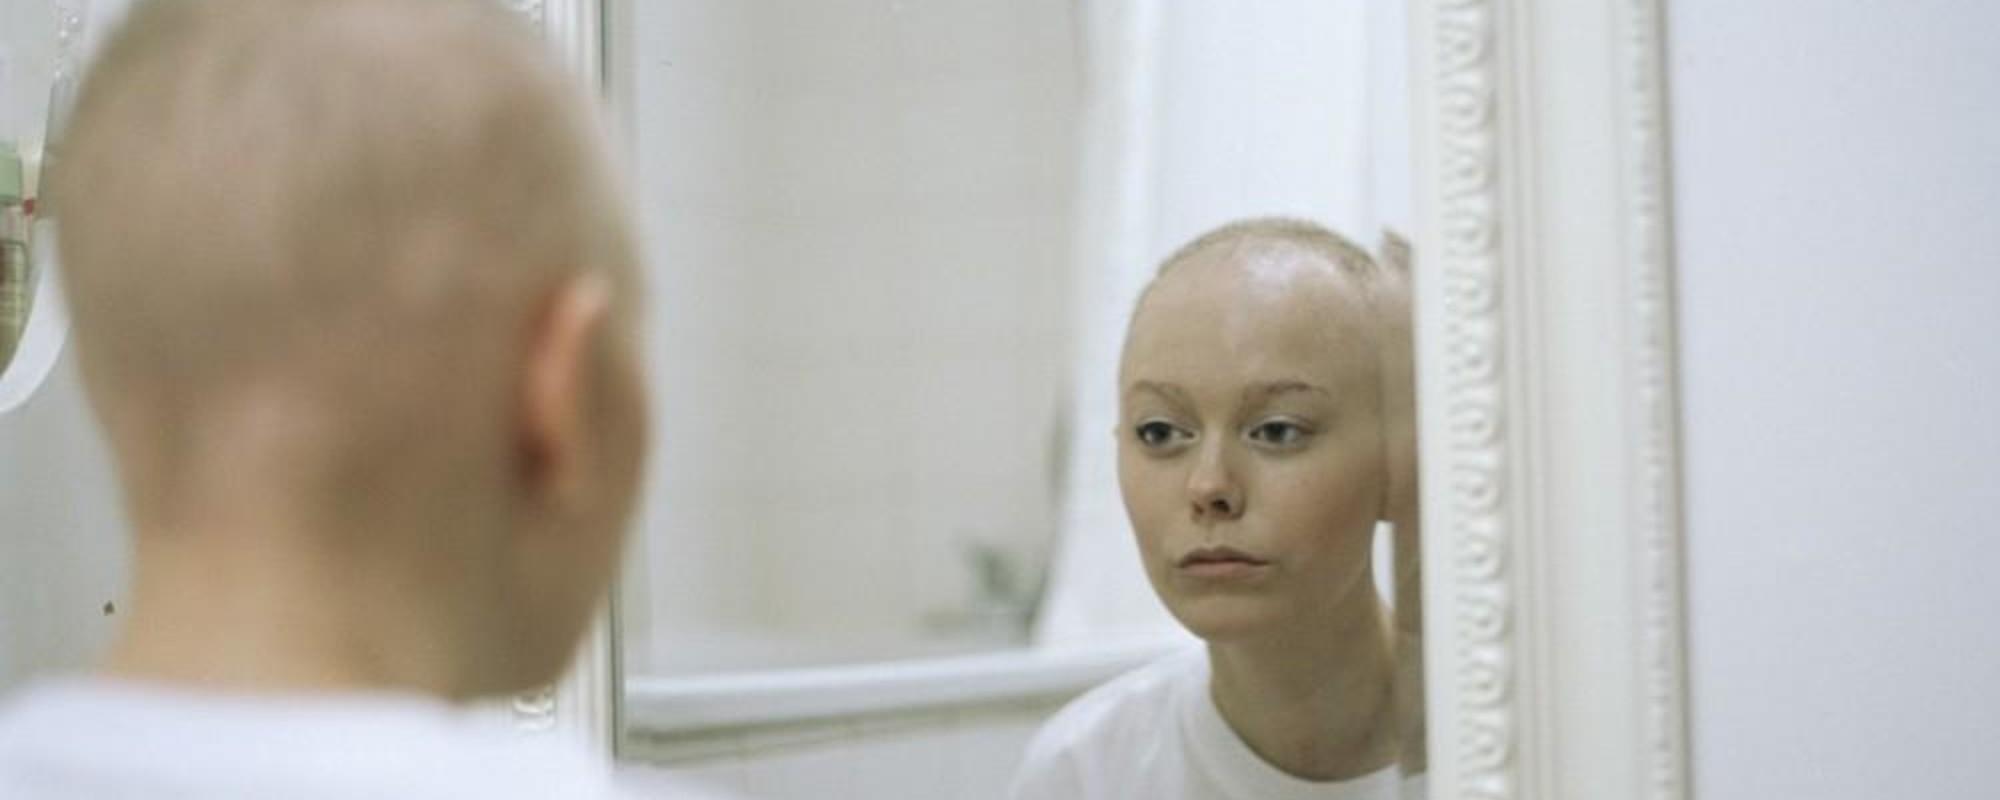 Wie sich das Leben verändert, wenn die Freundin an Krebs erkrankt